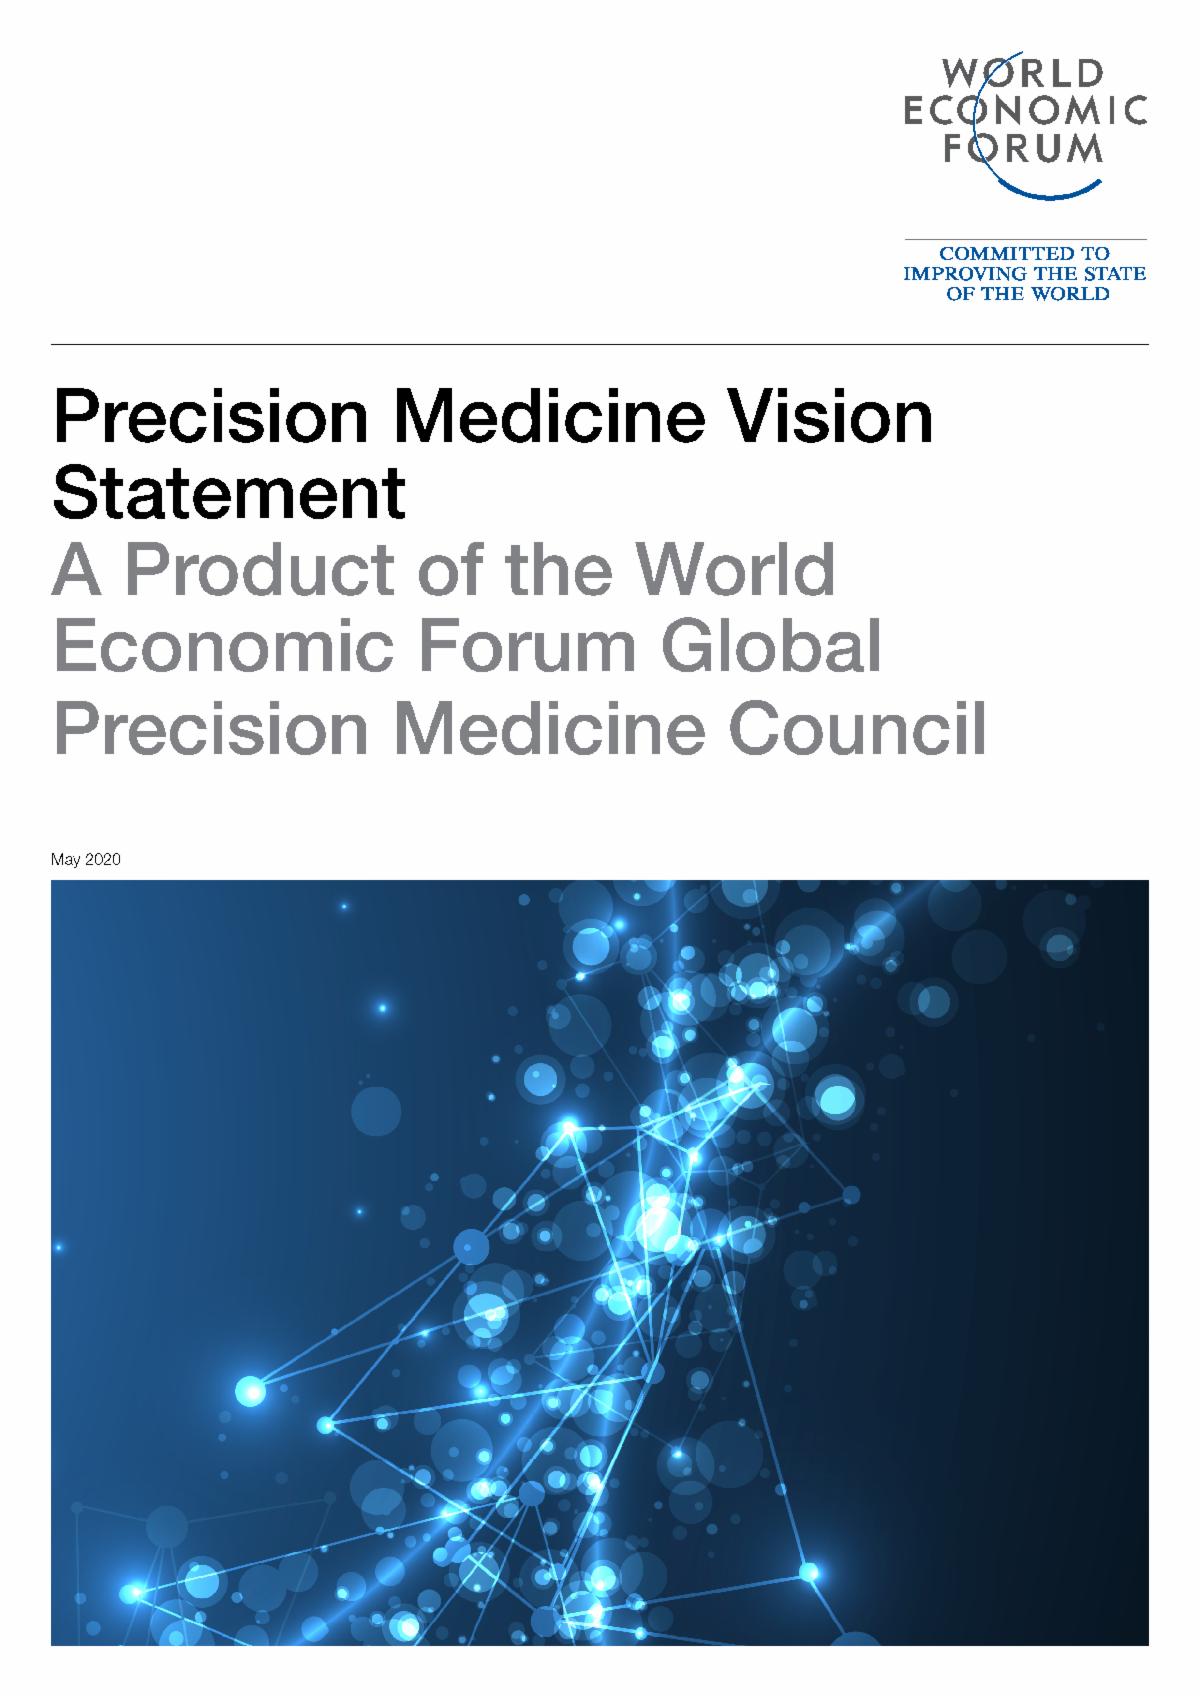 Cover of WEF Precision Medicine Vision Statement